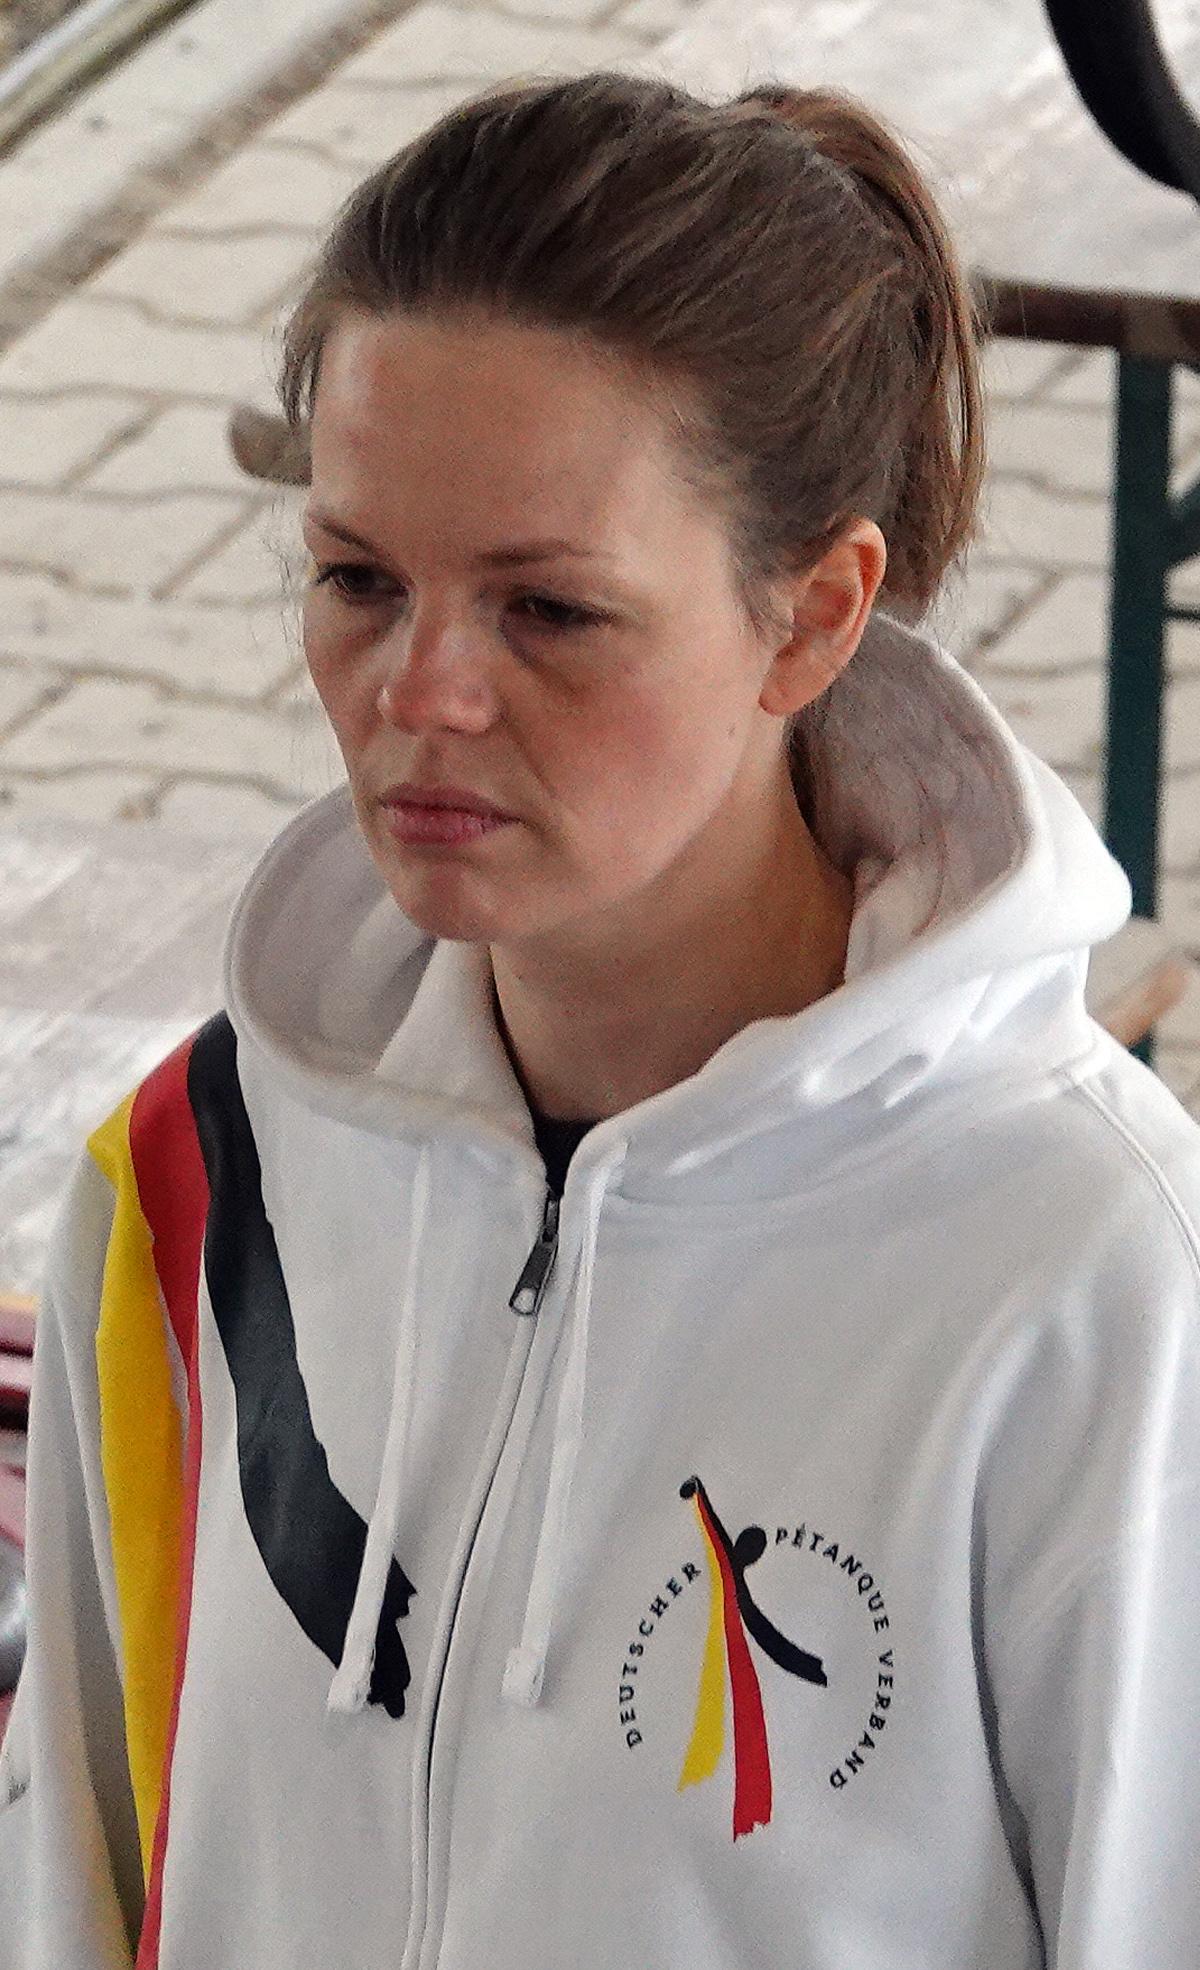 Anna Bonhoff